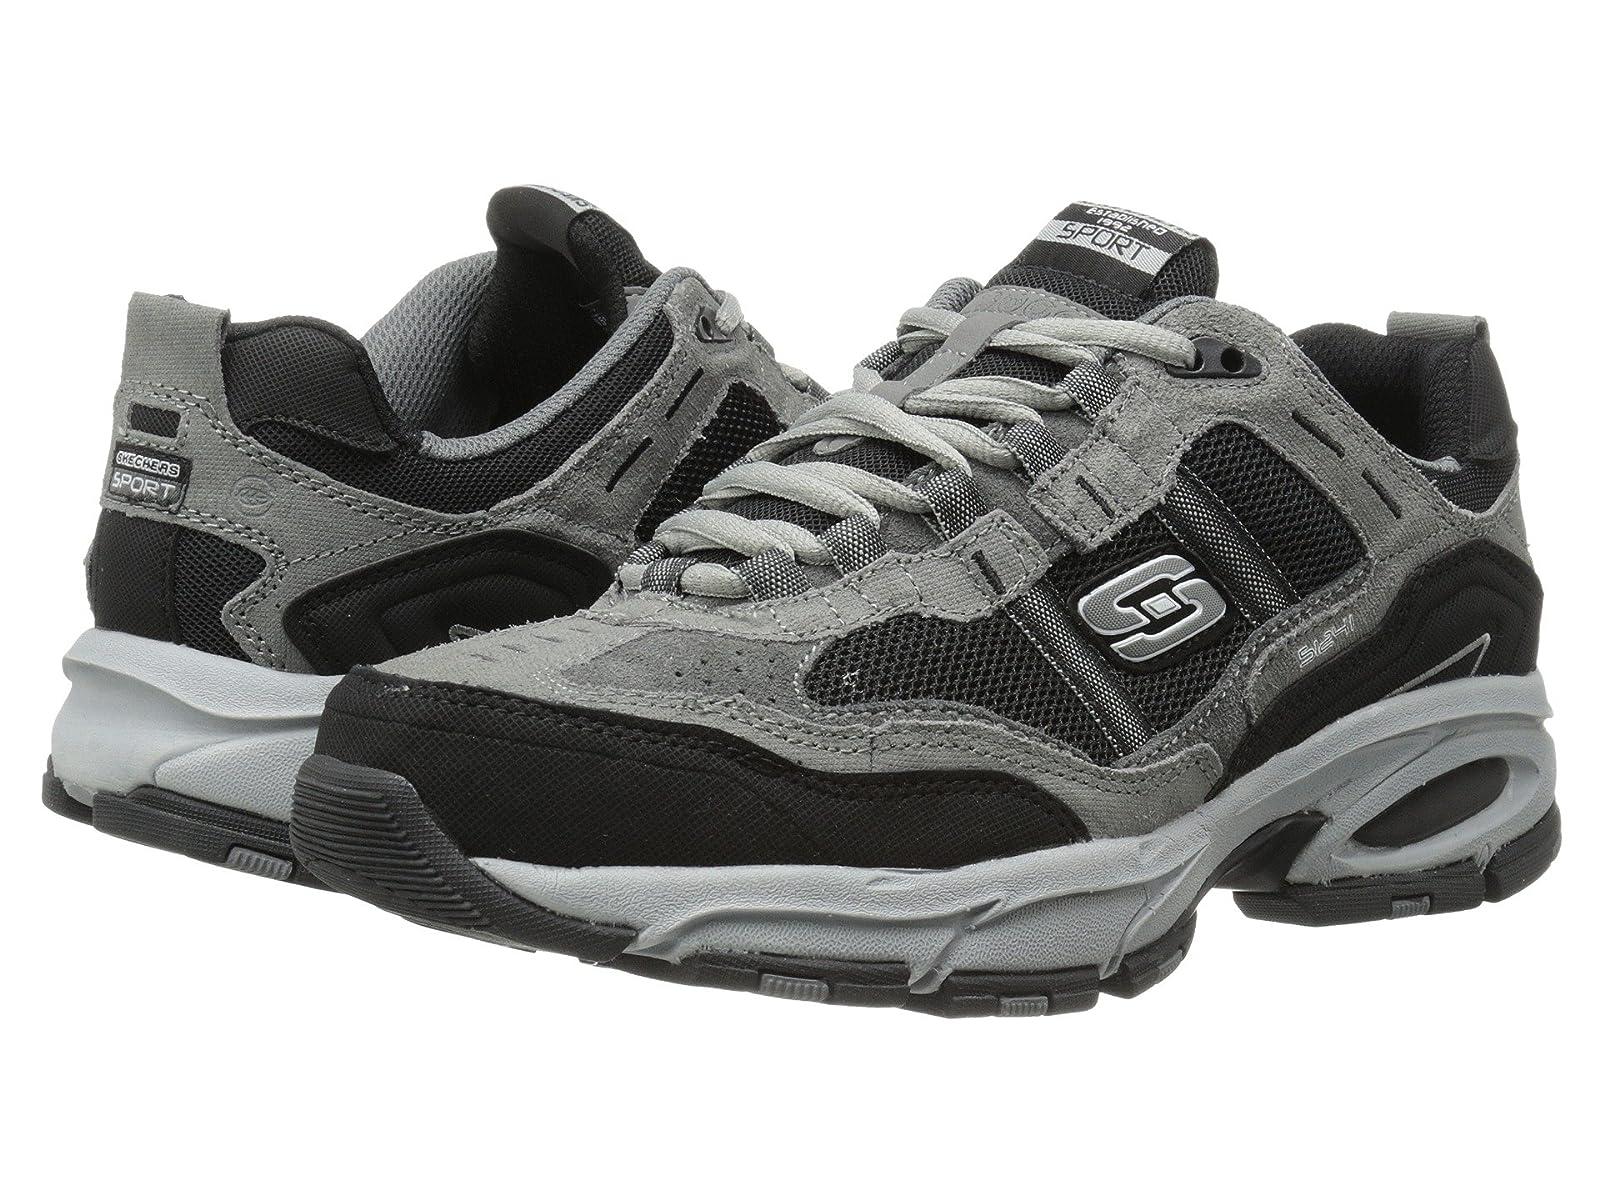 SKECHERS Vigor 2.0 TraitCheap and distinctive eye-catching shoes